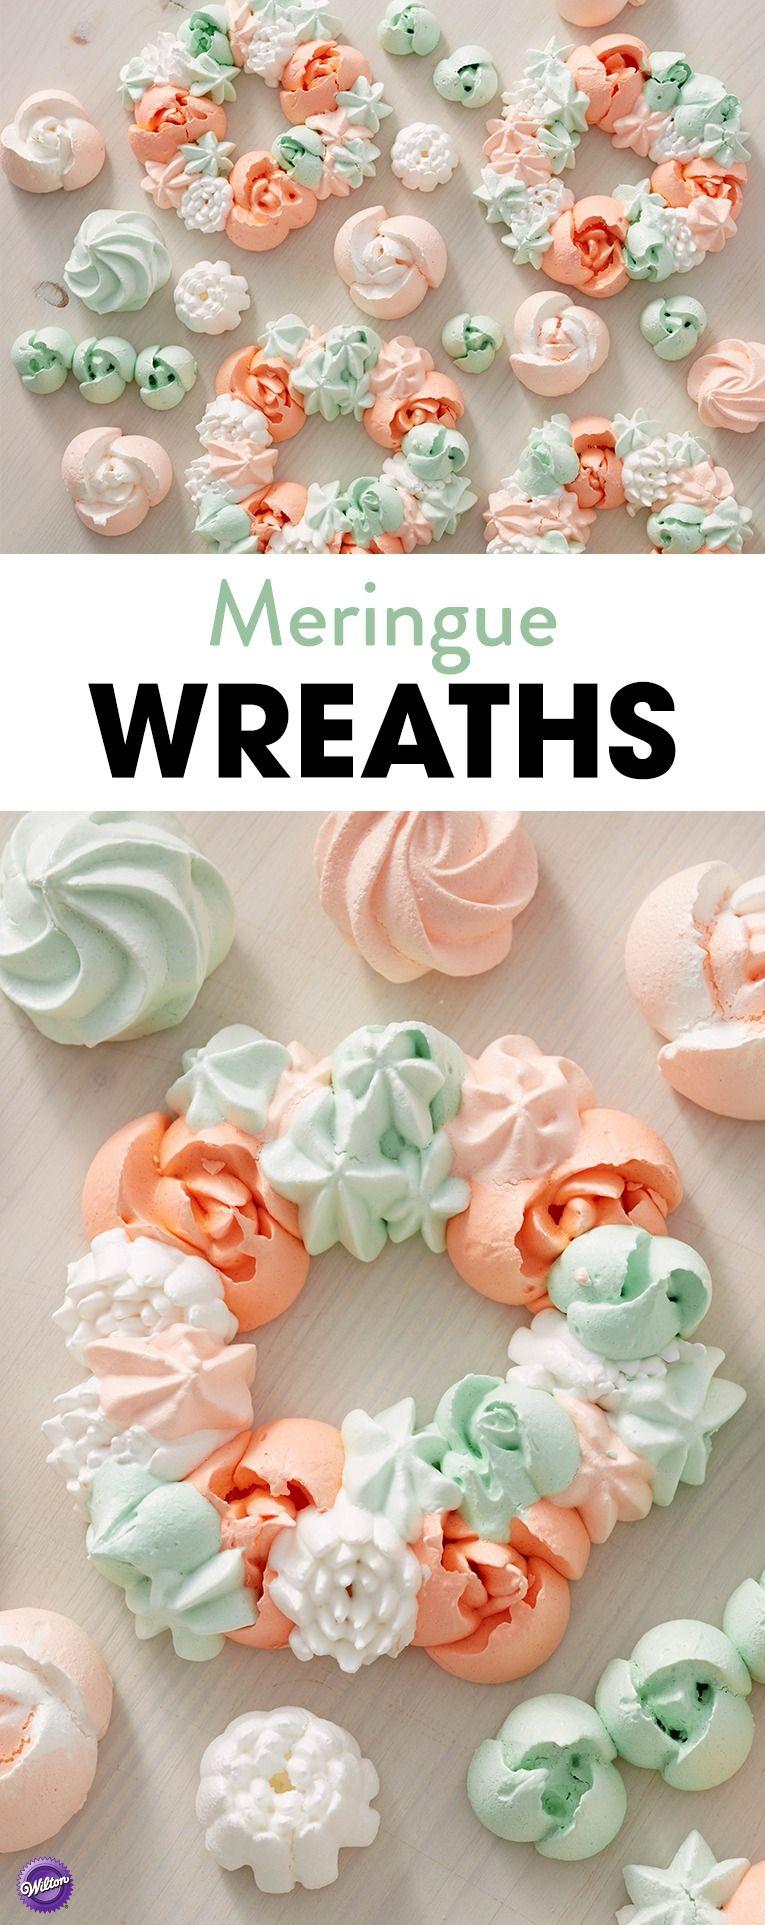 Meringue Wreath Cookies In 2019 Wedding Cakes And Desserts